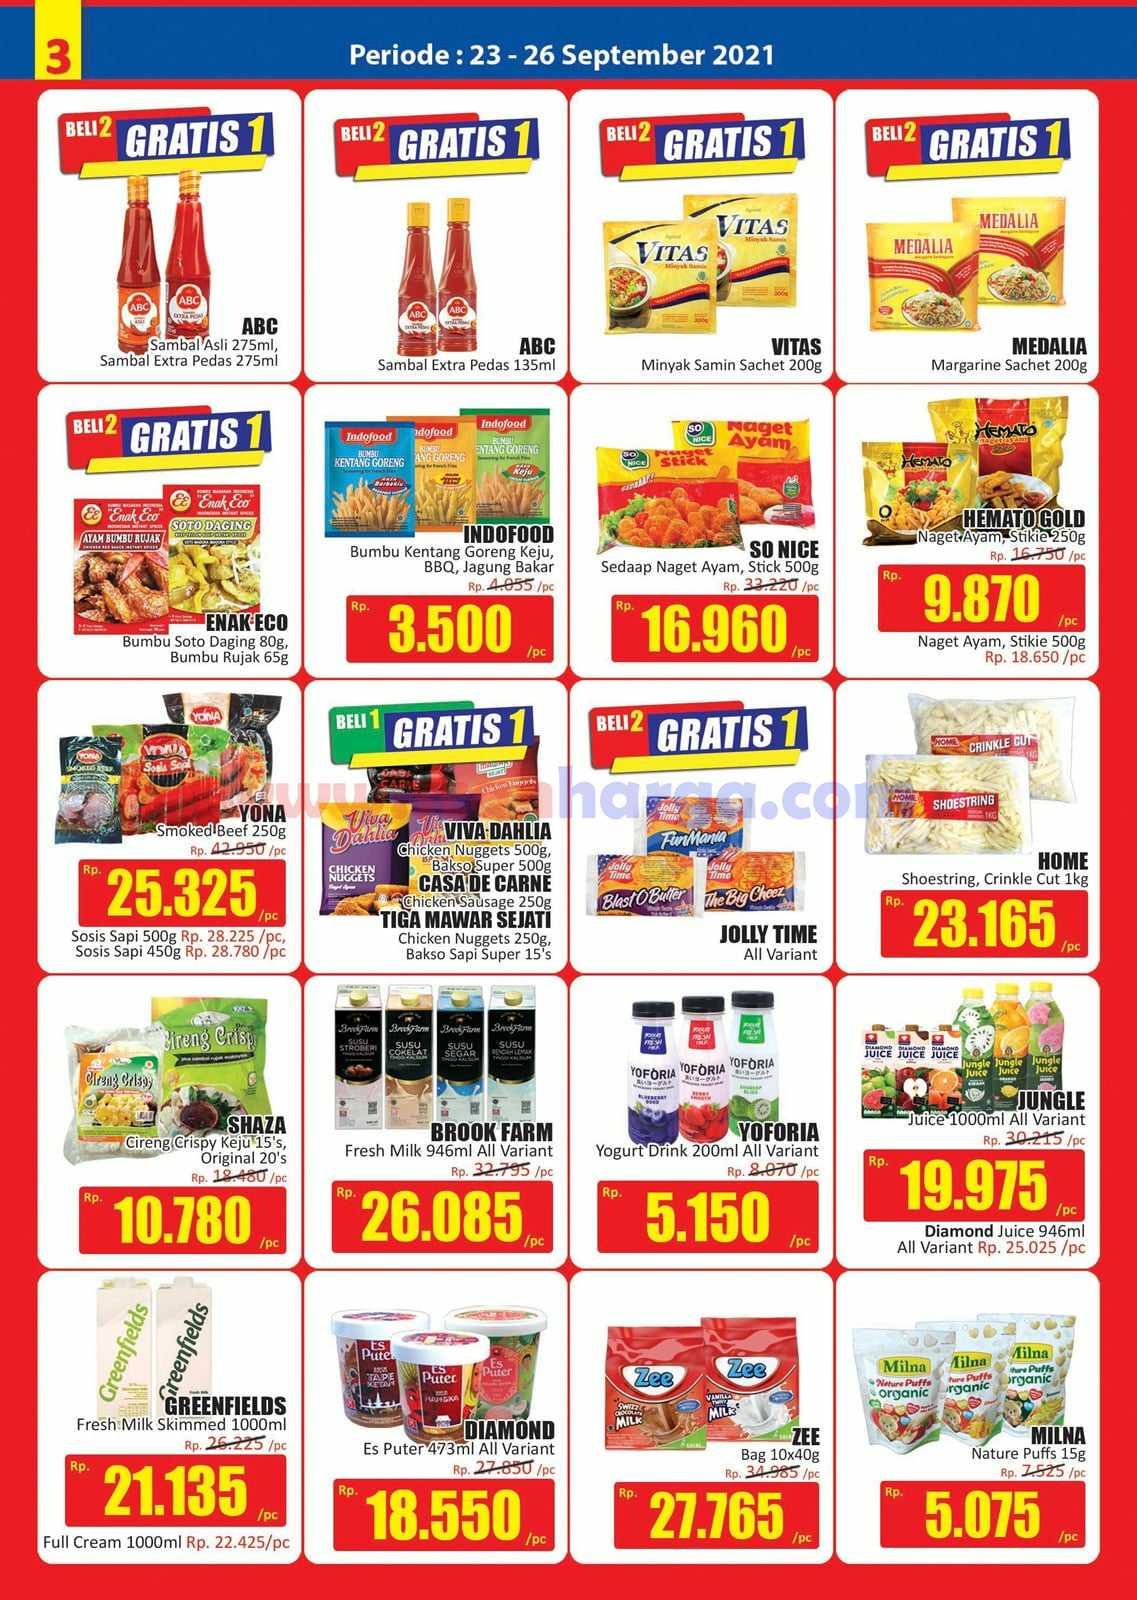 Katalog Promo JSM Hari Hari Swalayan Weekend 23 - 26 September 2021 3